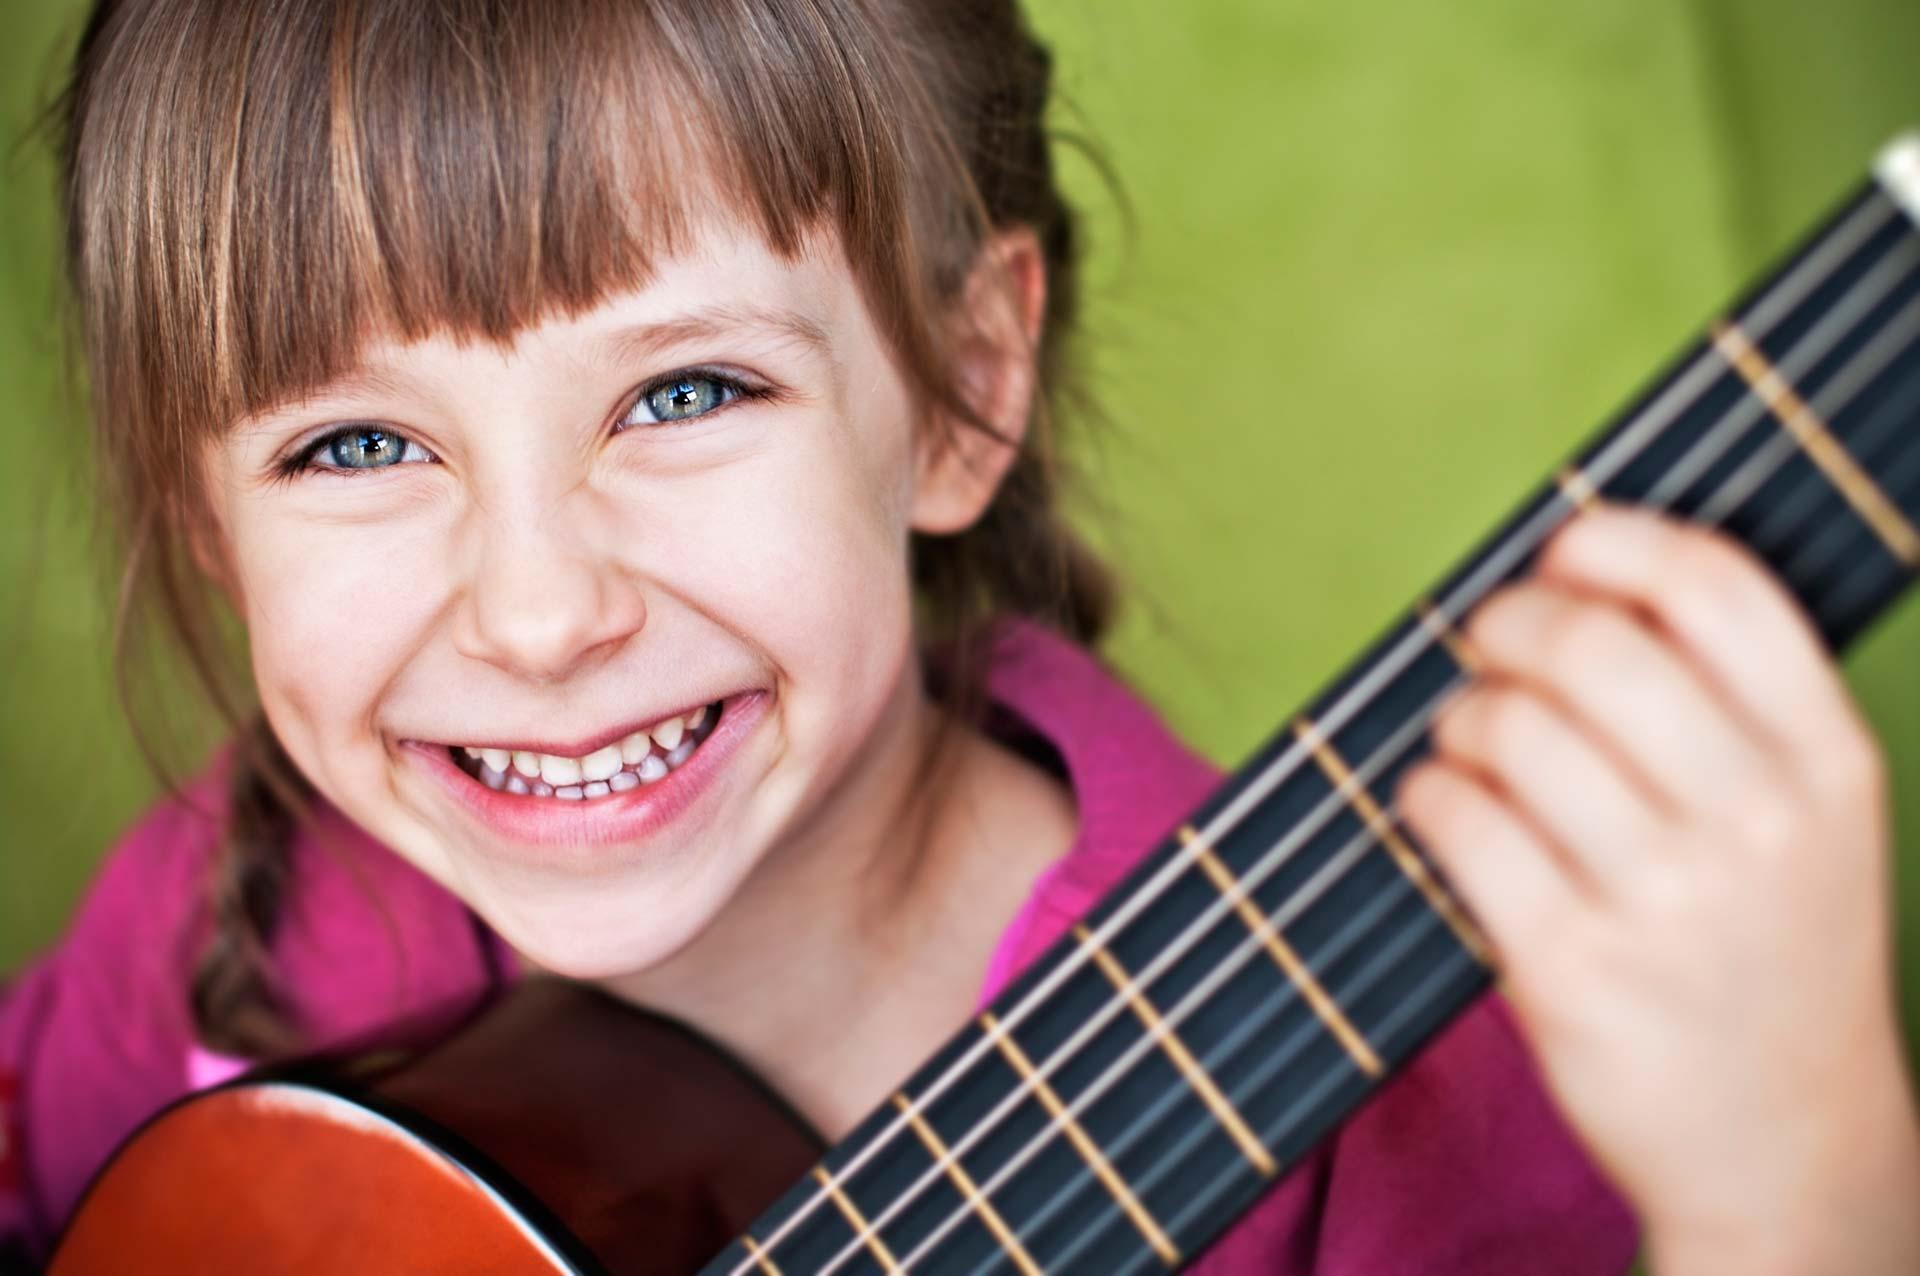 child childrens music school - HD1920×1276